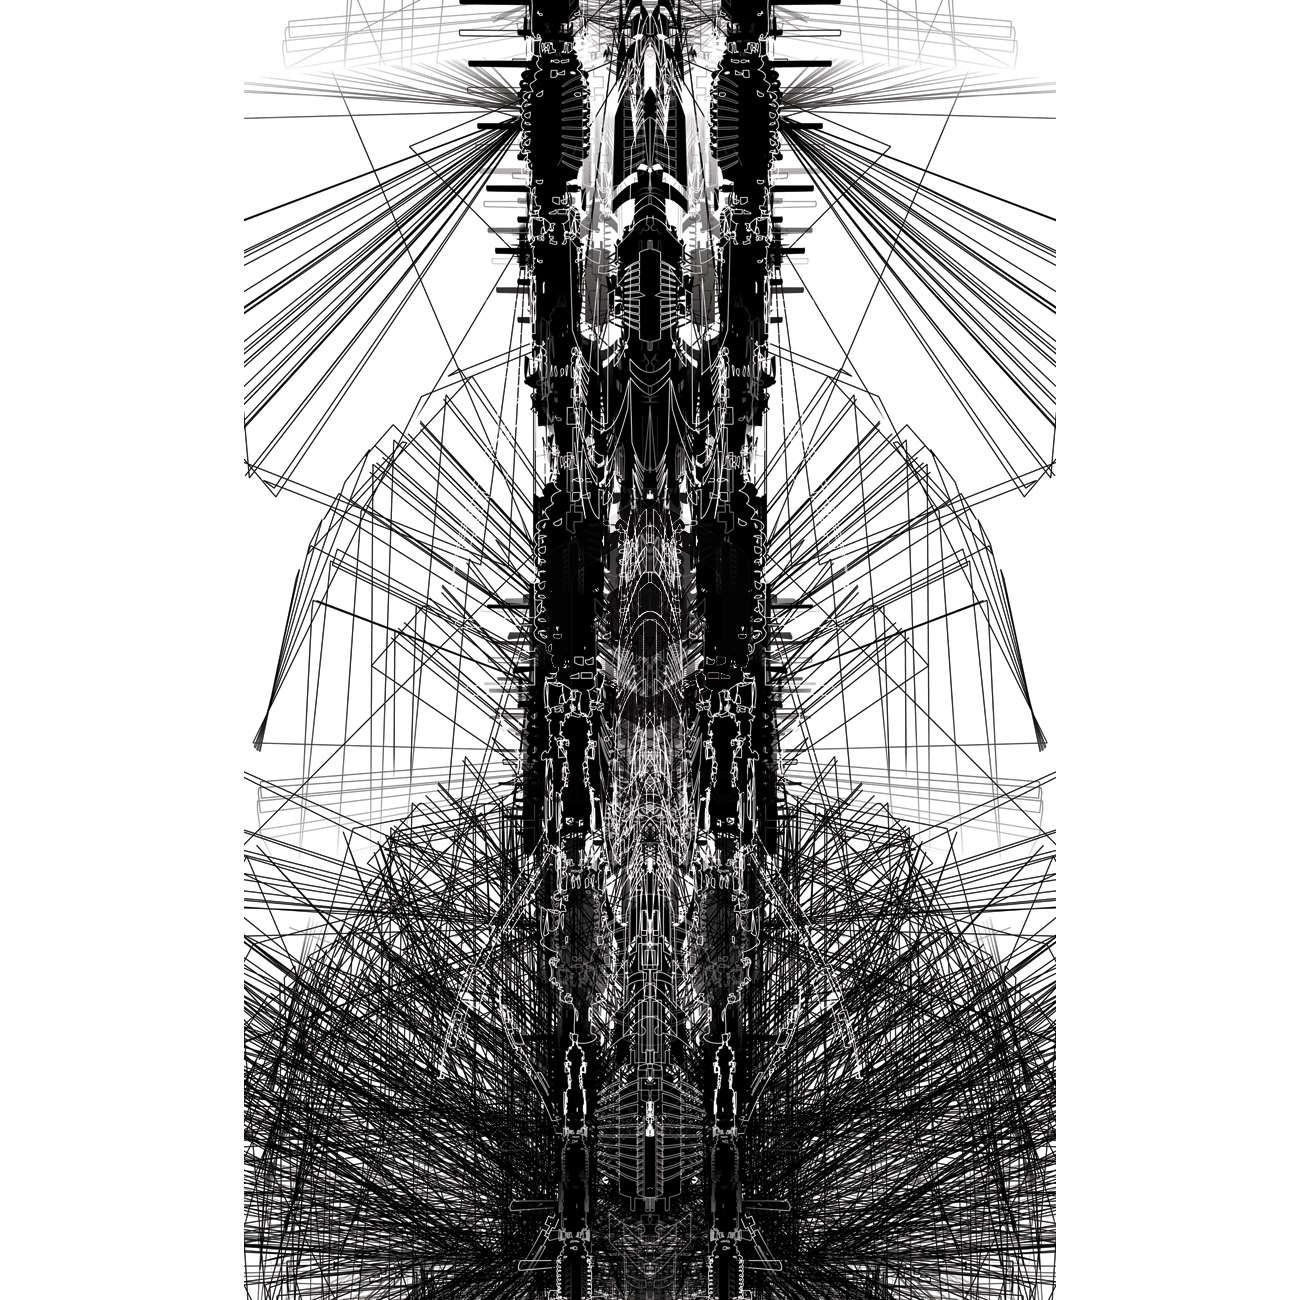 HARALD art numerique Pandorart Dekompomatic